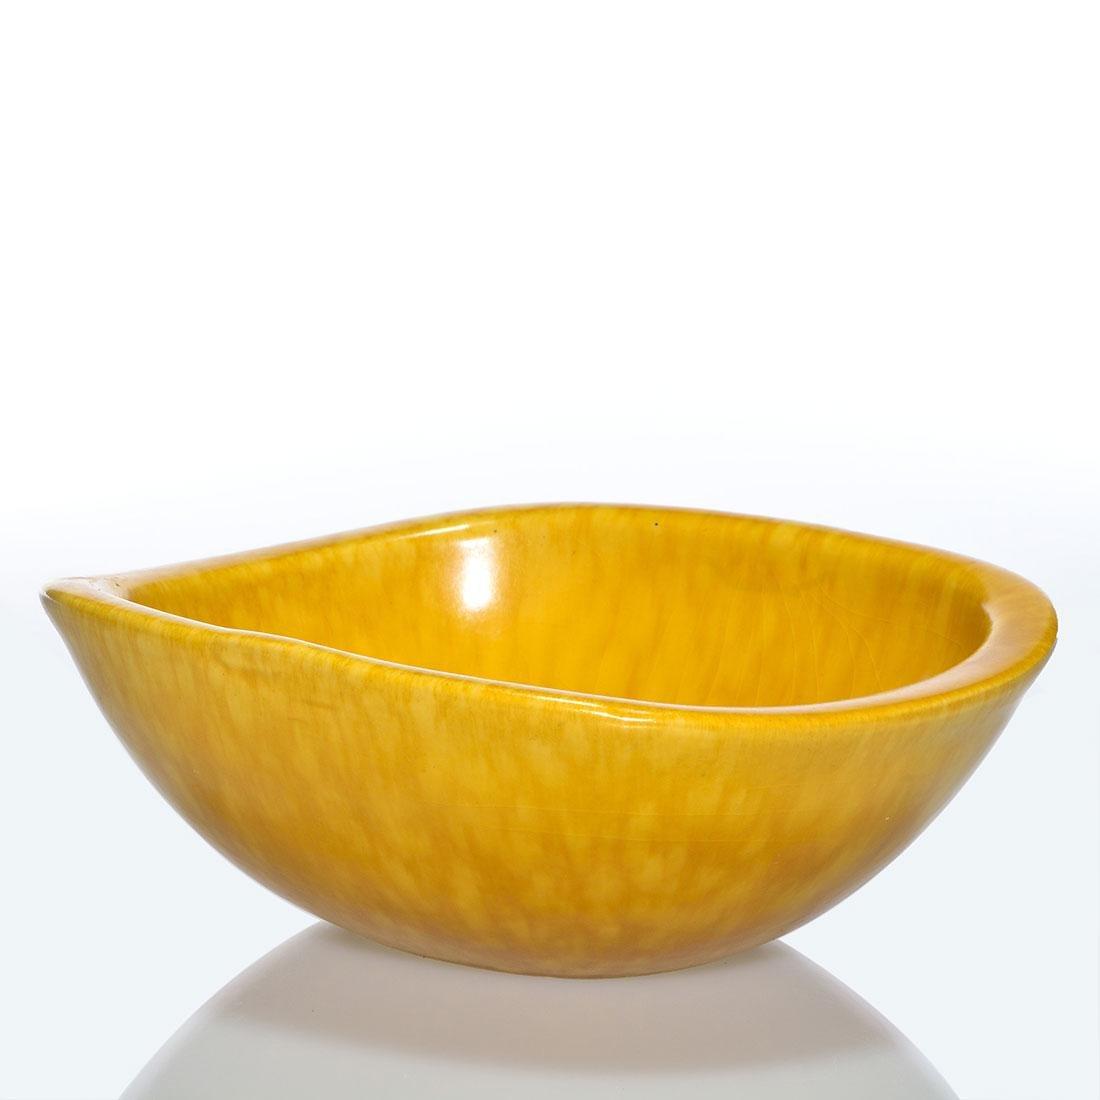 Roseville Raymor Bowl, Gold, 2 7/8 x 8 inches, shape